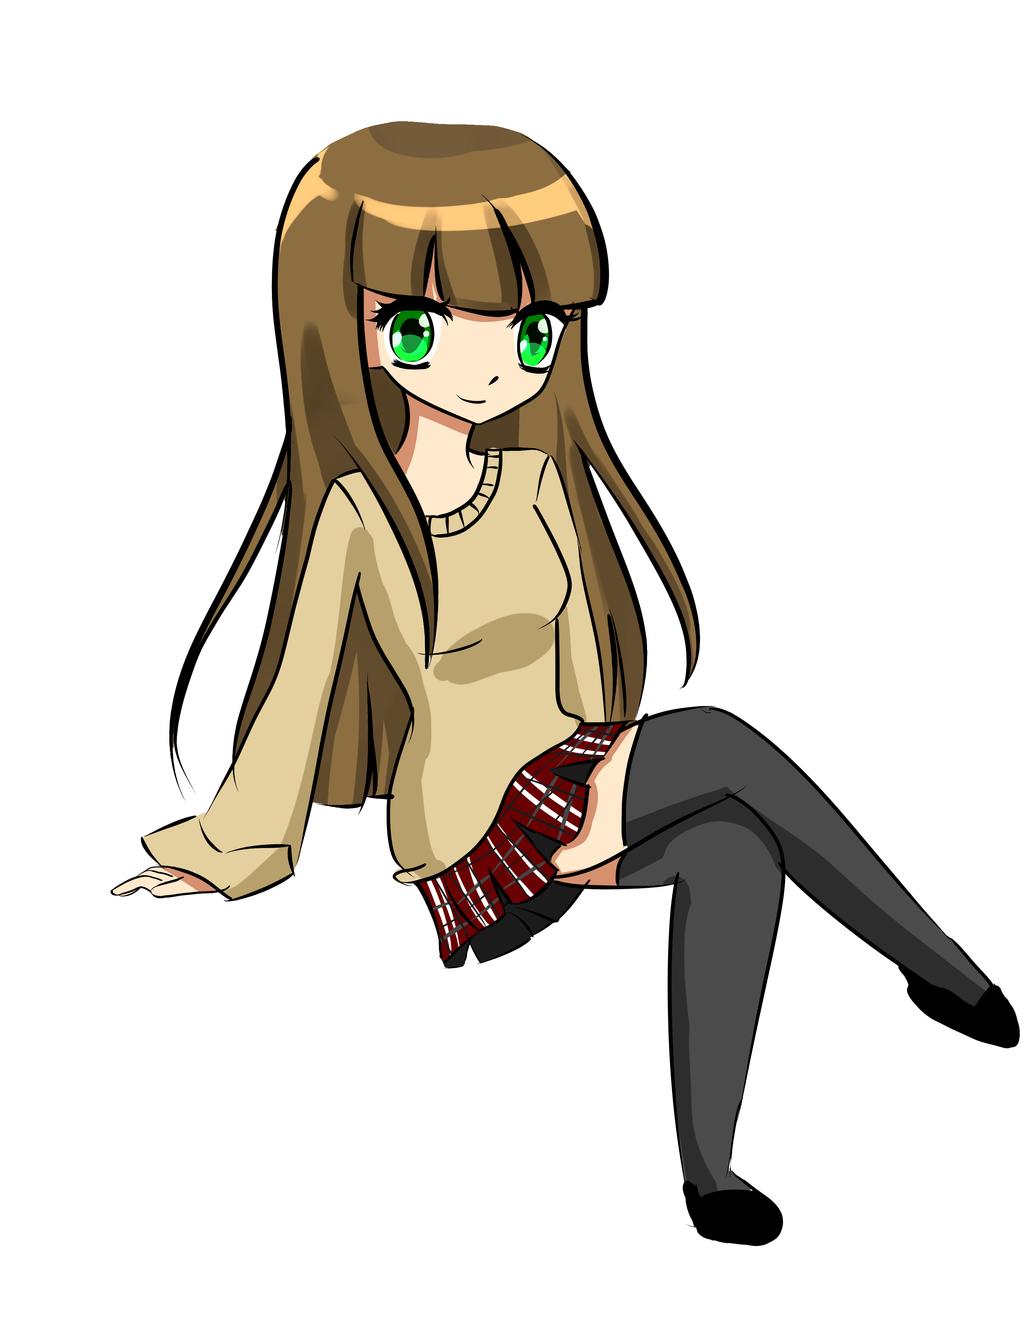 Nerd Girl Doodle by daisy1357911 on DeviantArt